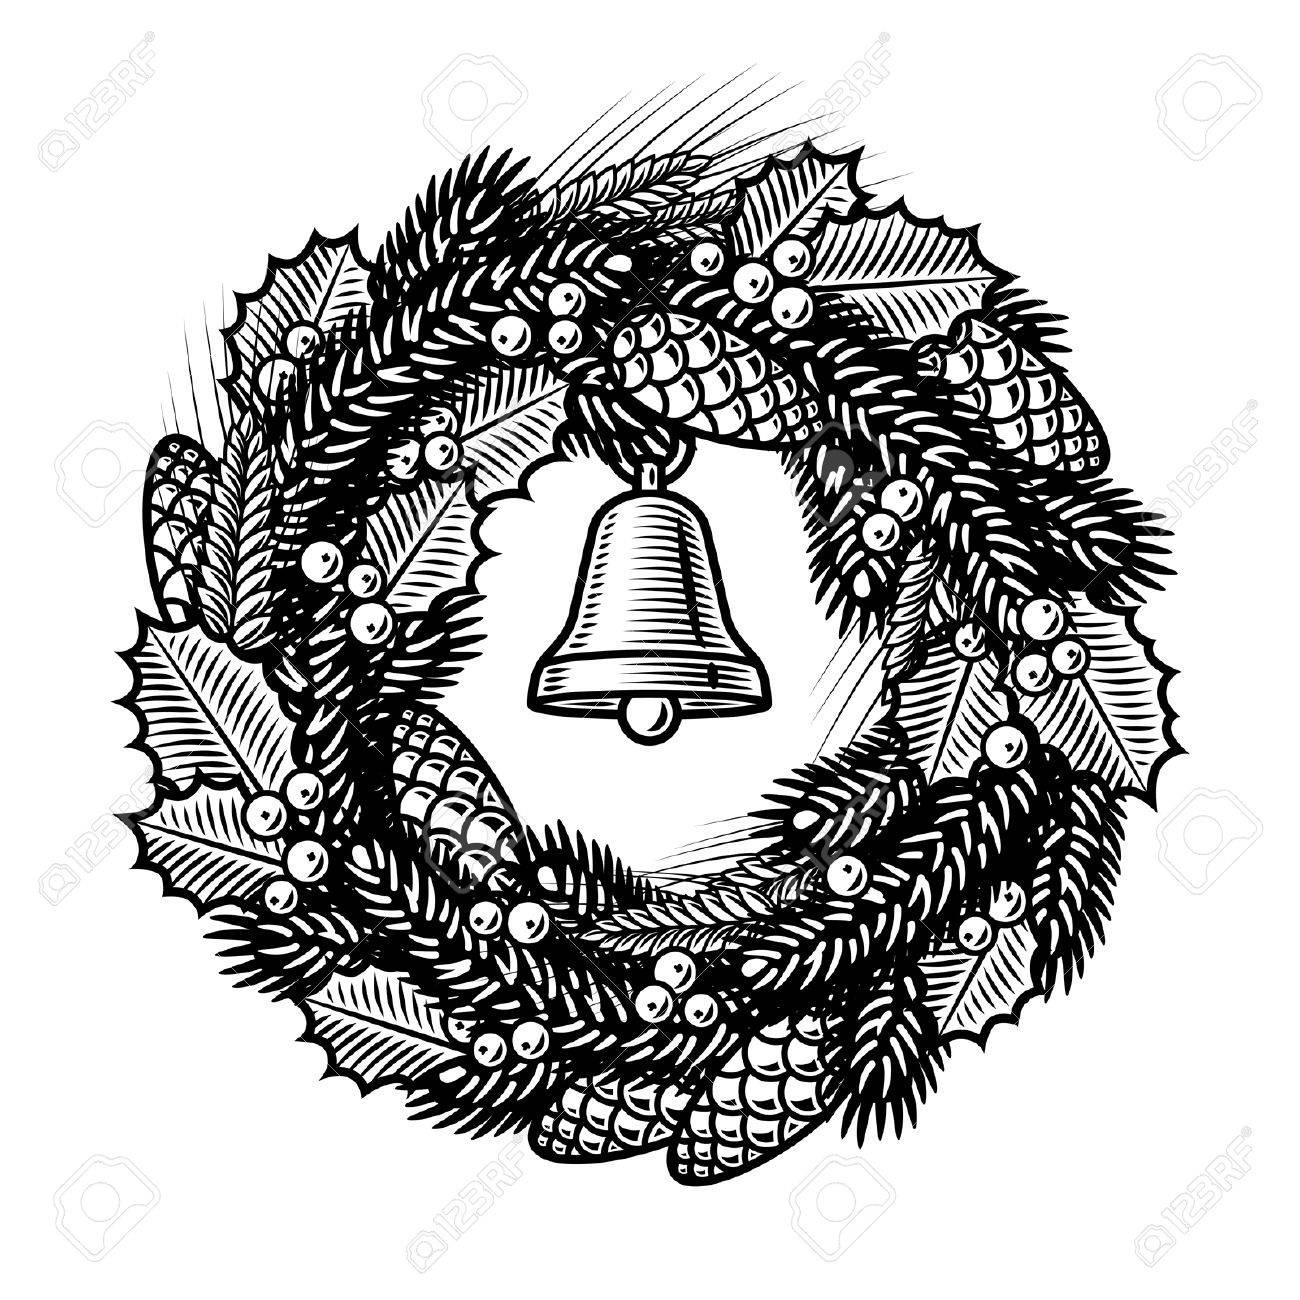 Retro Christmas wreath black and white.